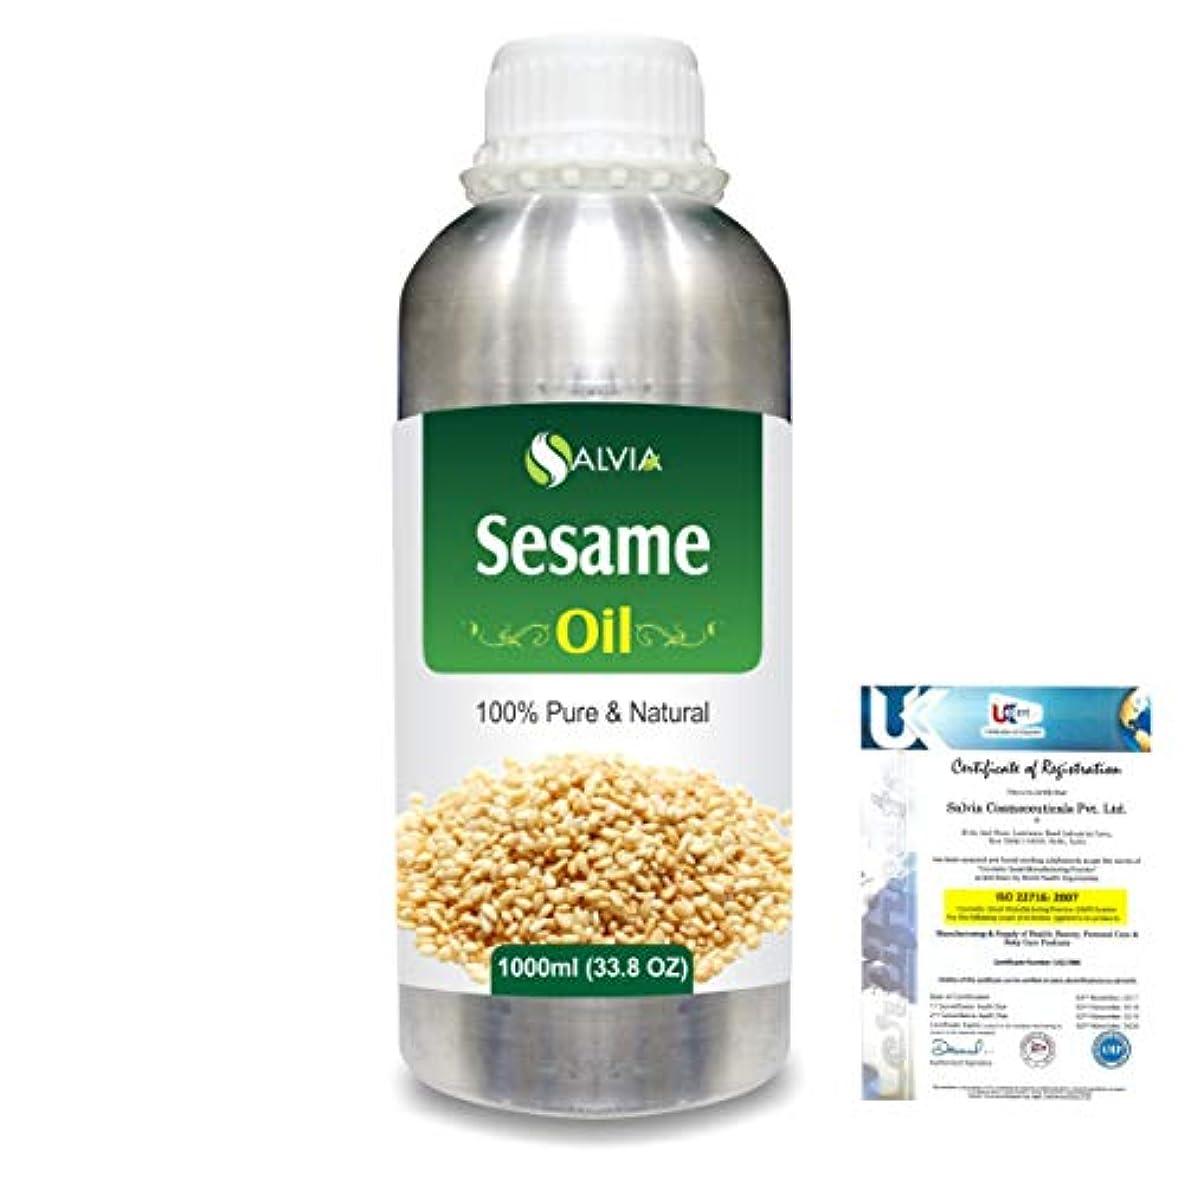 予測入場料葉Sesame (Sesamum Indicum) 100% Natural Pure Undiluted Uncut Carrier Oil 1000ml/33.8 fl.oz.